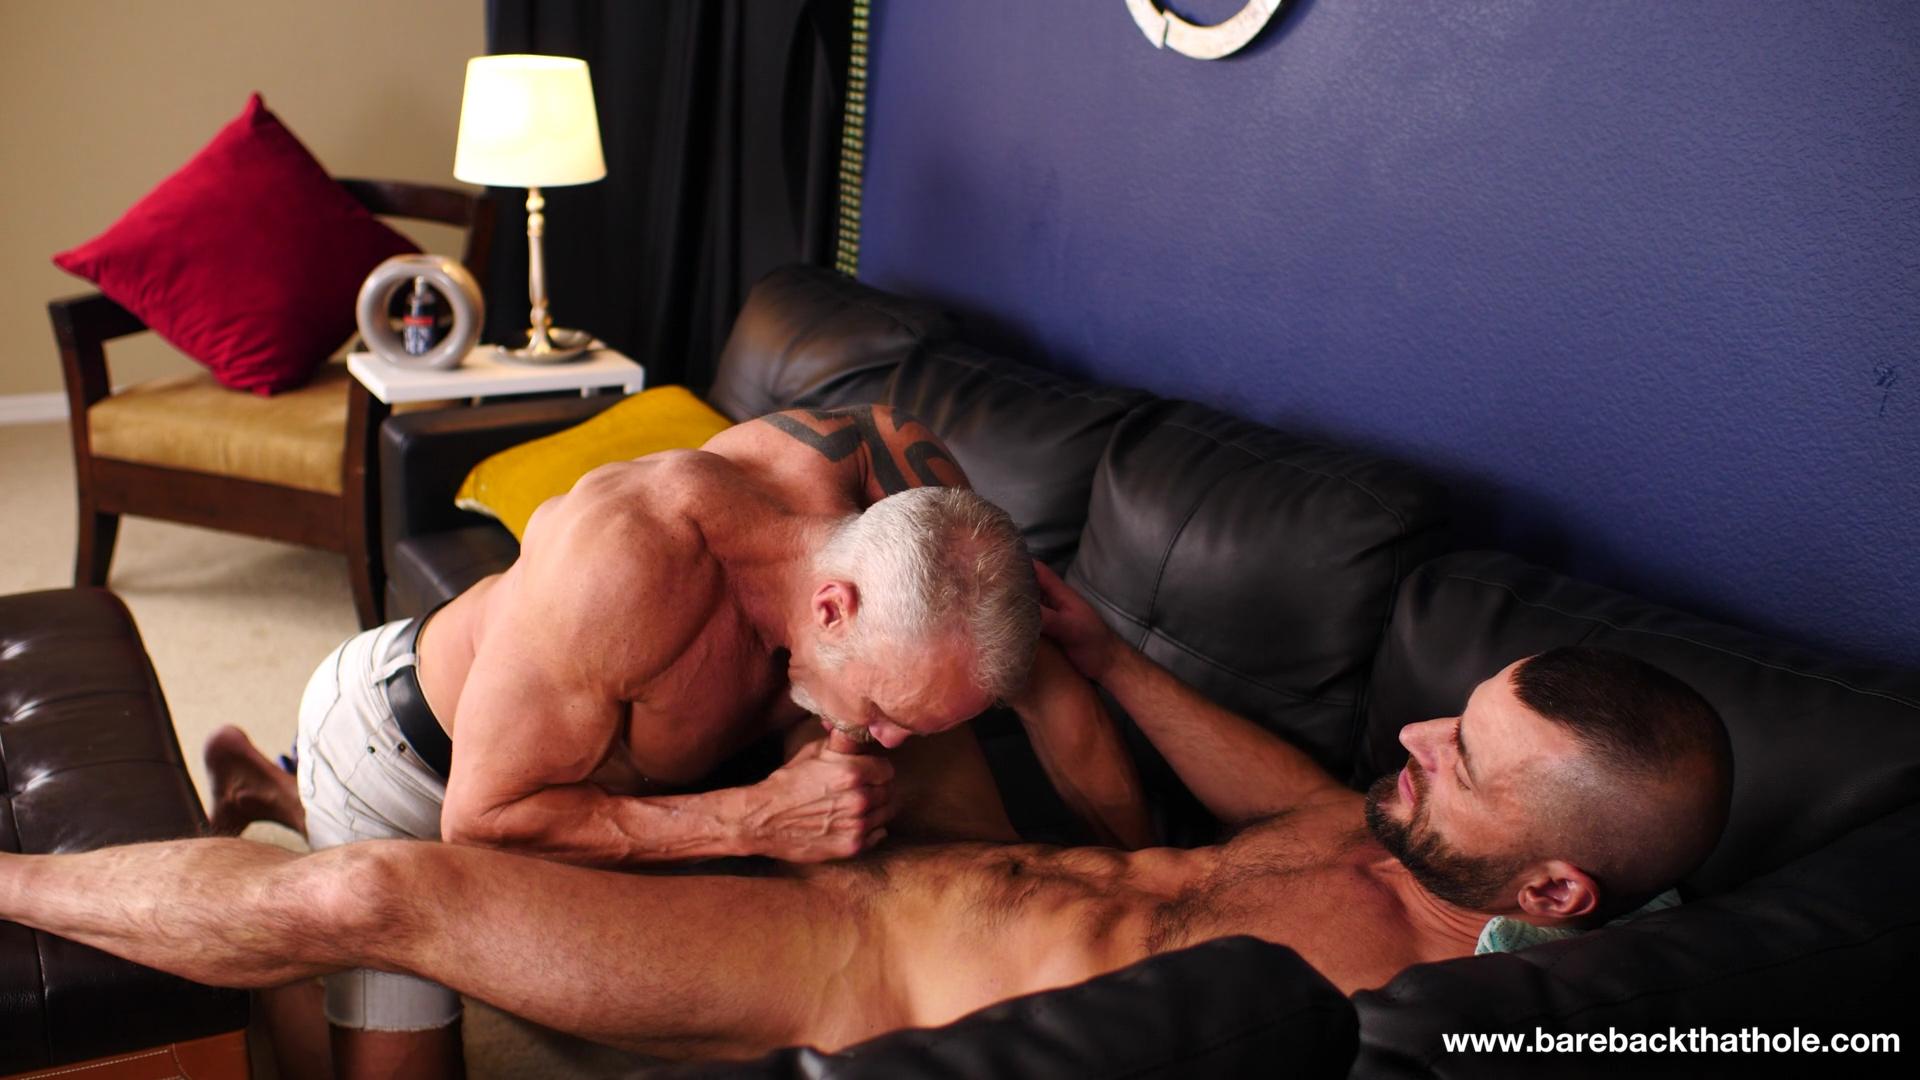 Dallas Steele and Jake Morgan